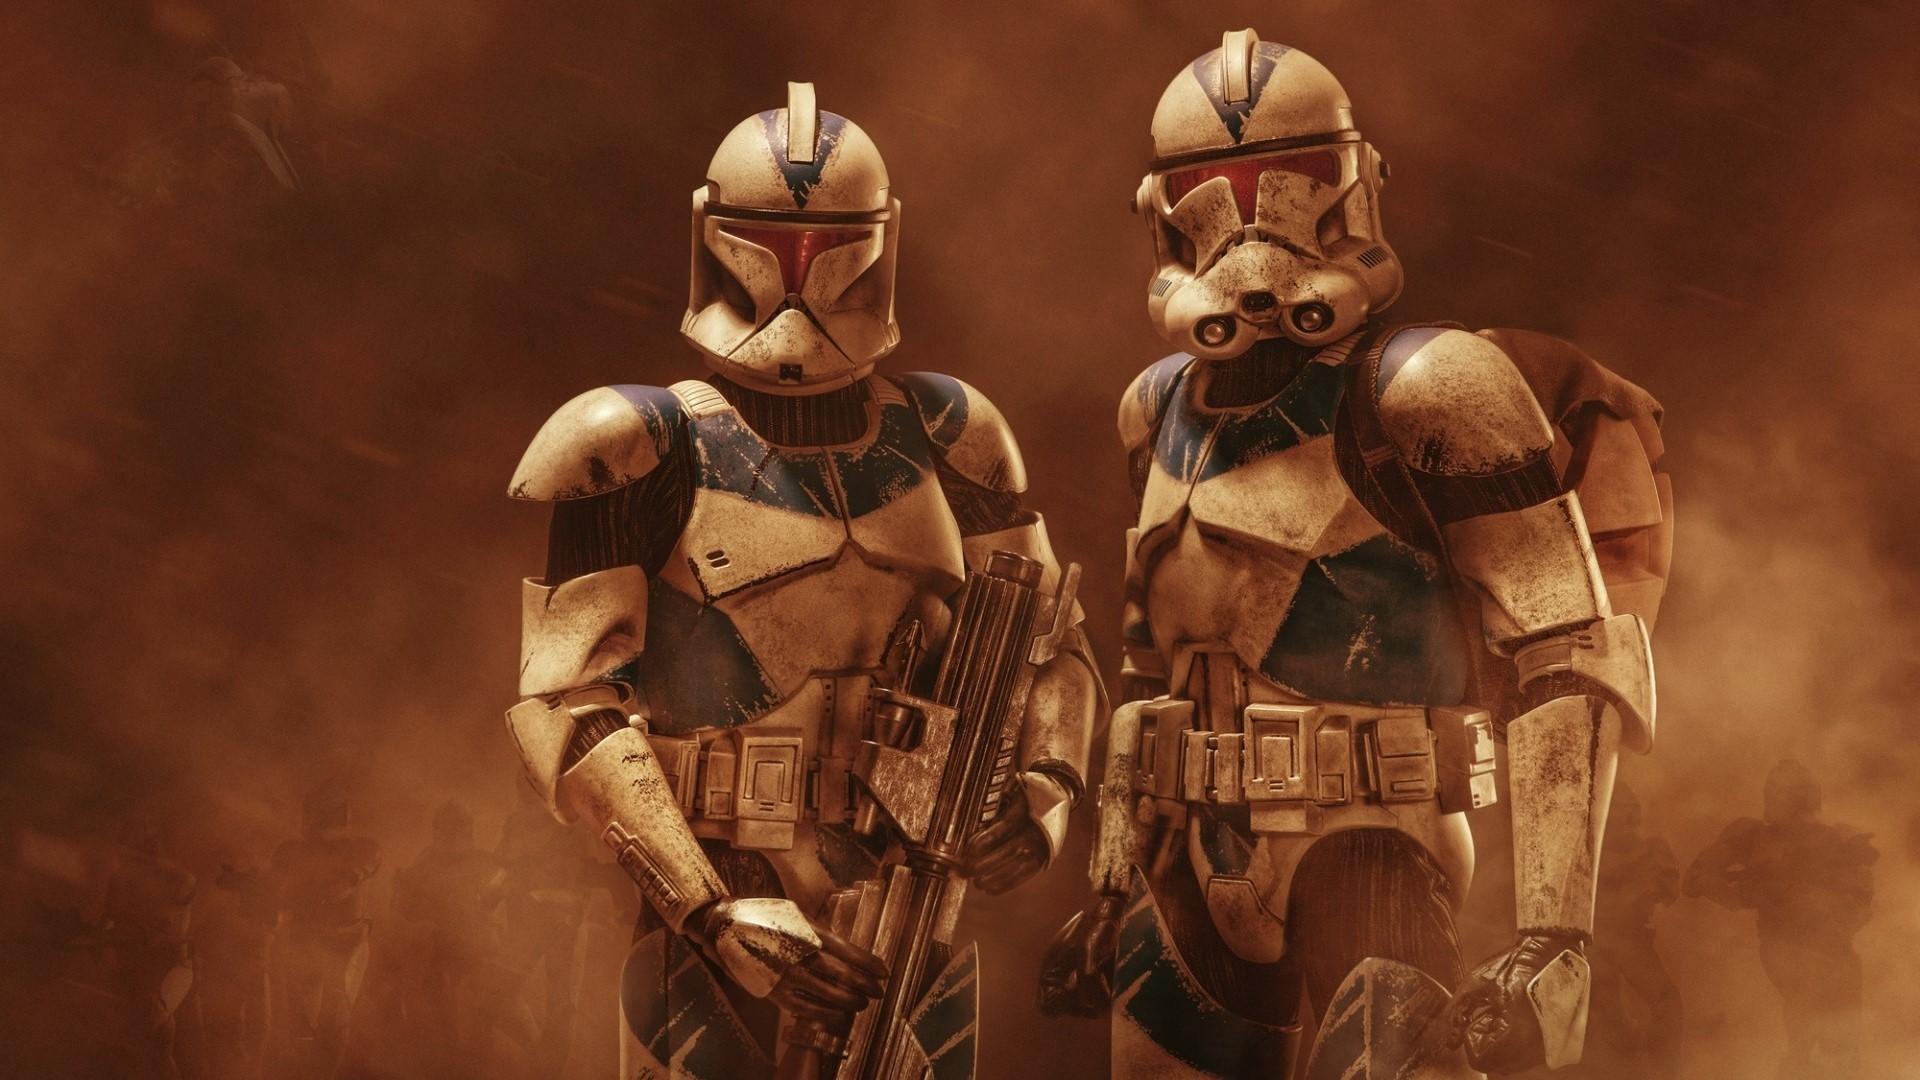 Star Wars Wallpaper Dump